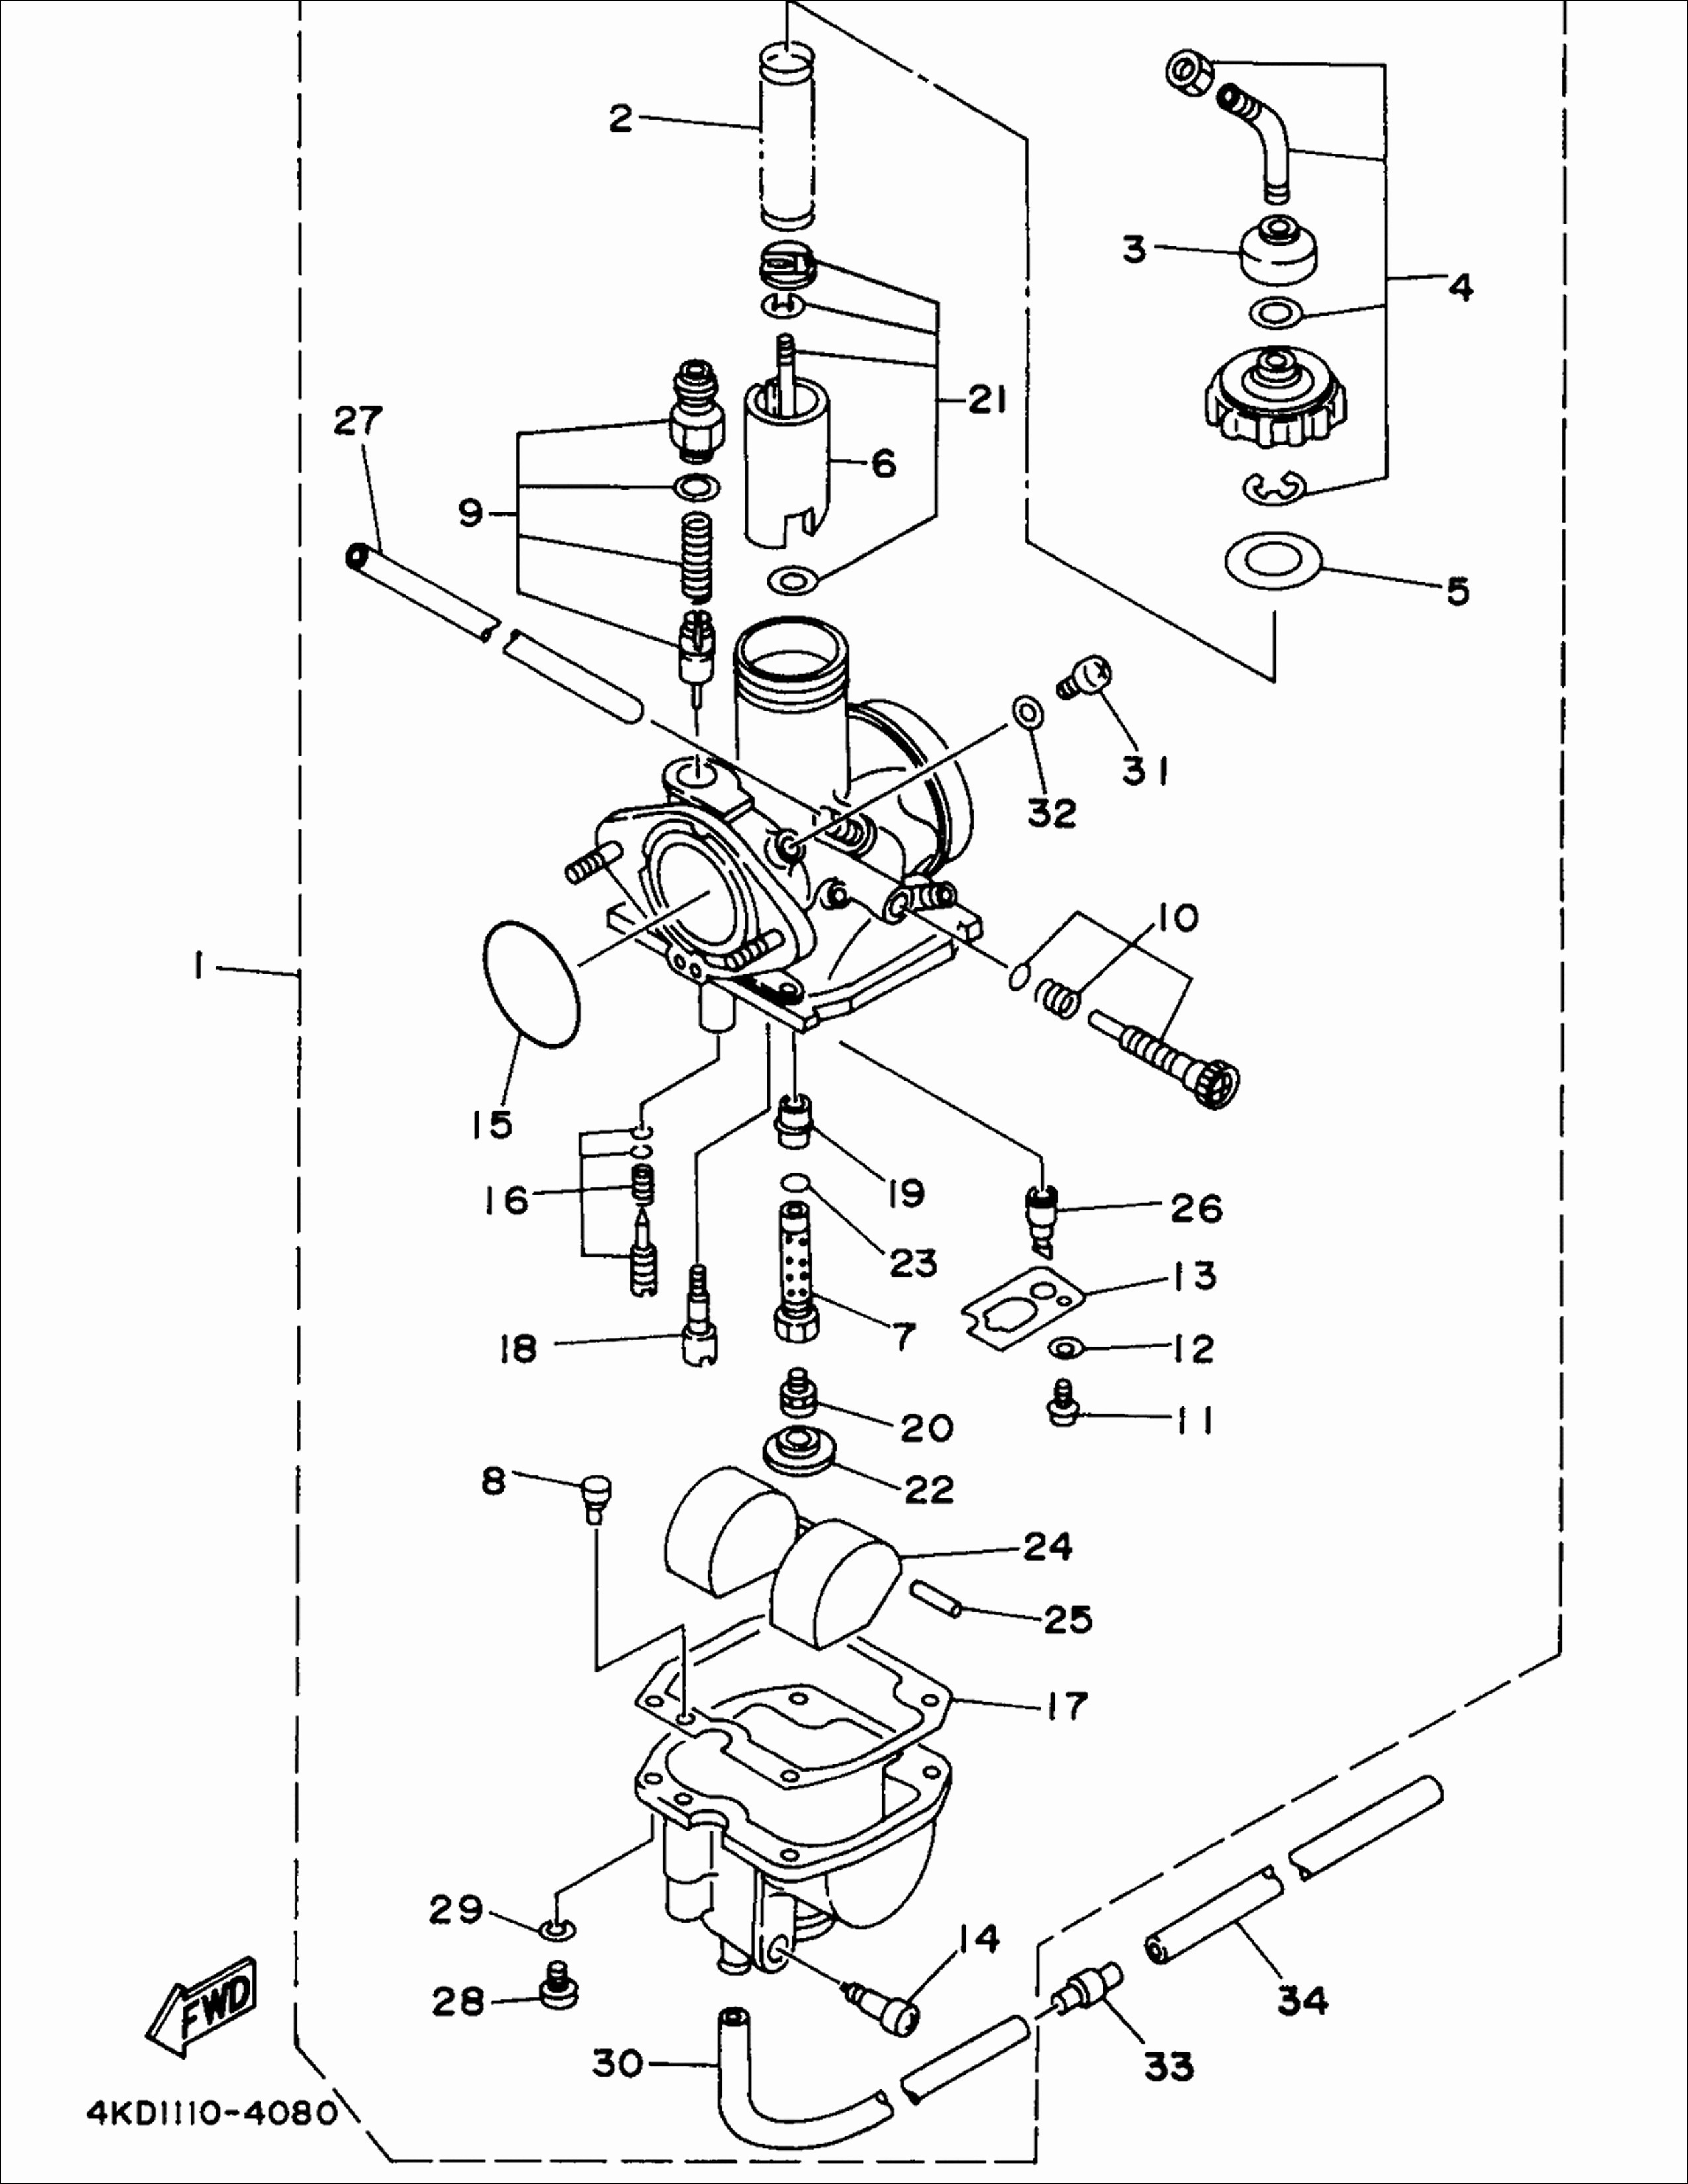 2008 Jeep Wrangler Radio Wiring Diagram